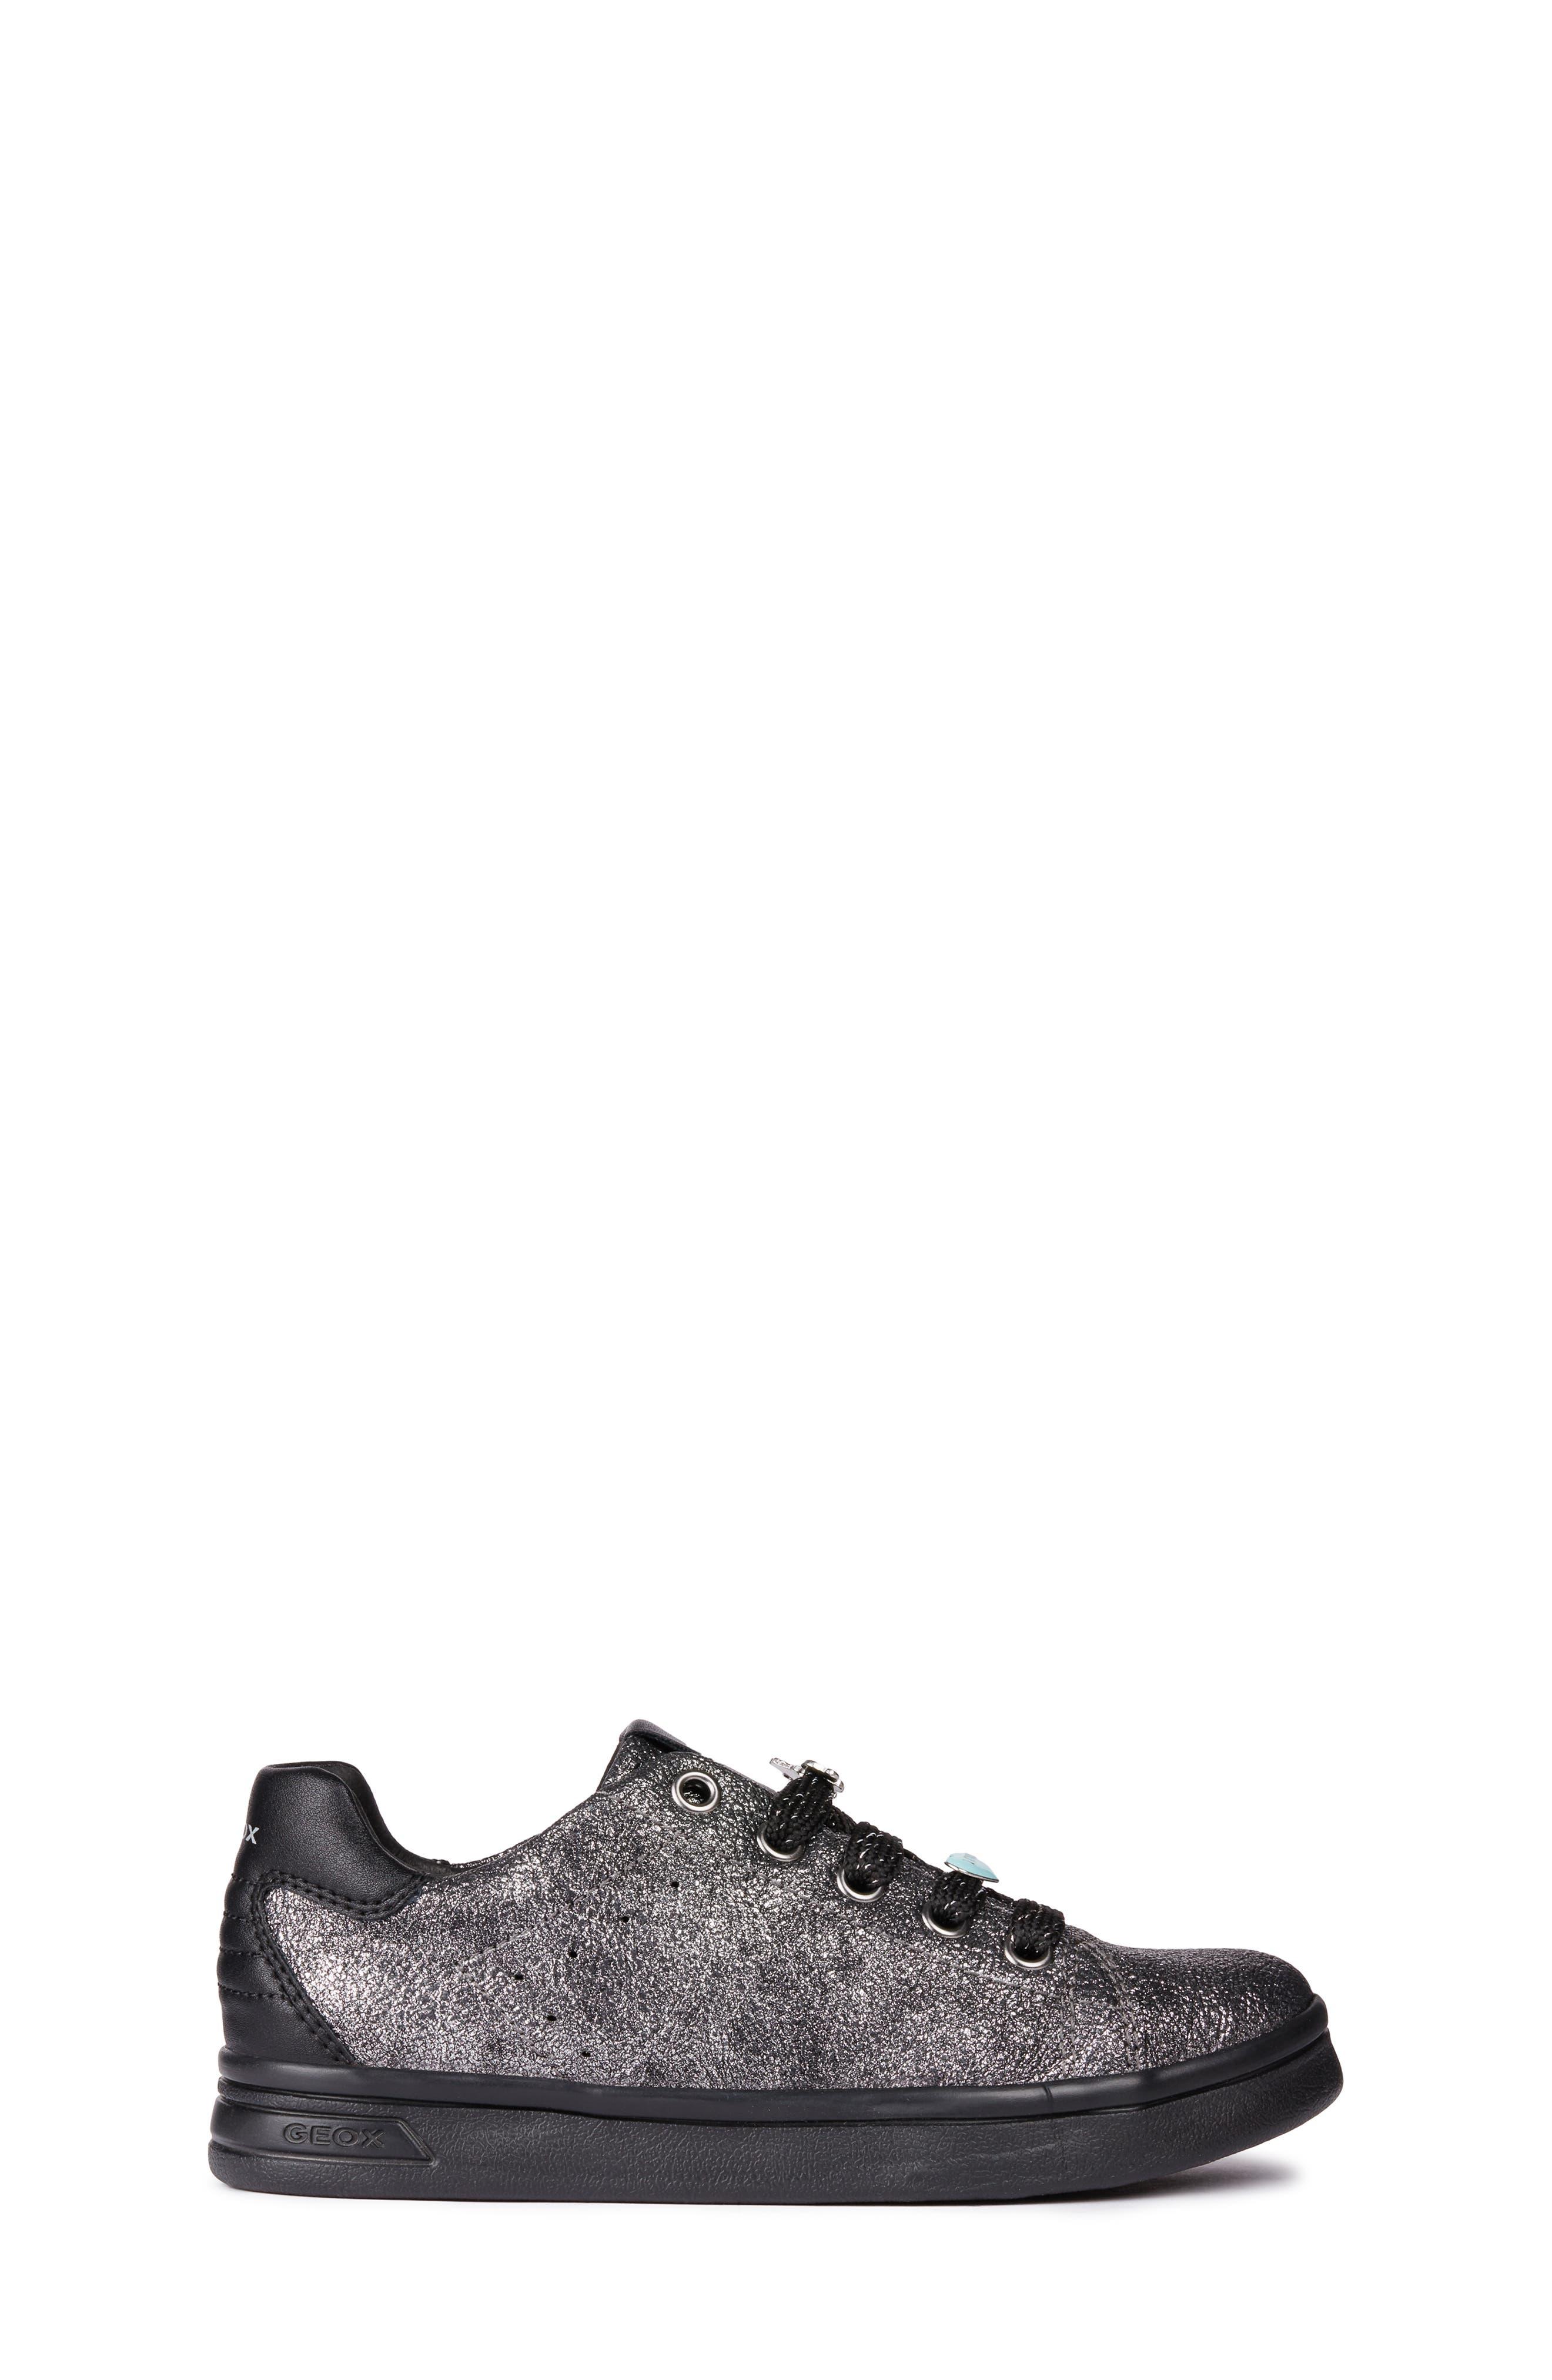 DJ Rock Metallic Sneaker,                             Alternate thumbnail 3, color,                             DARK SILVER